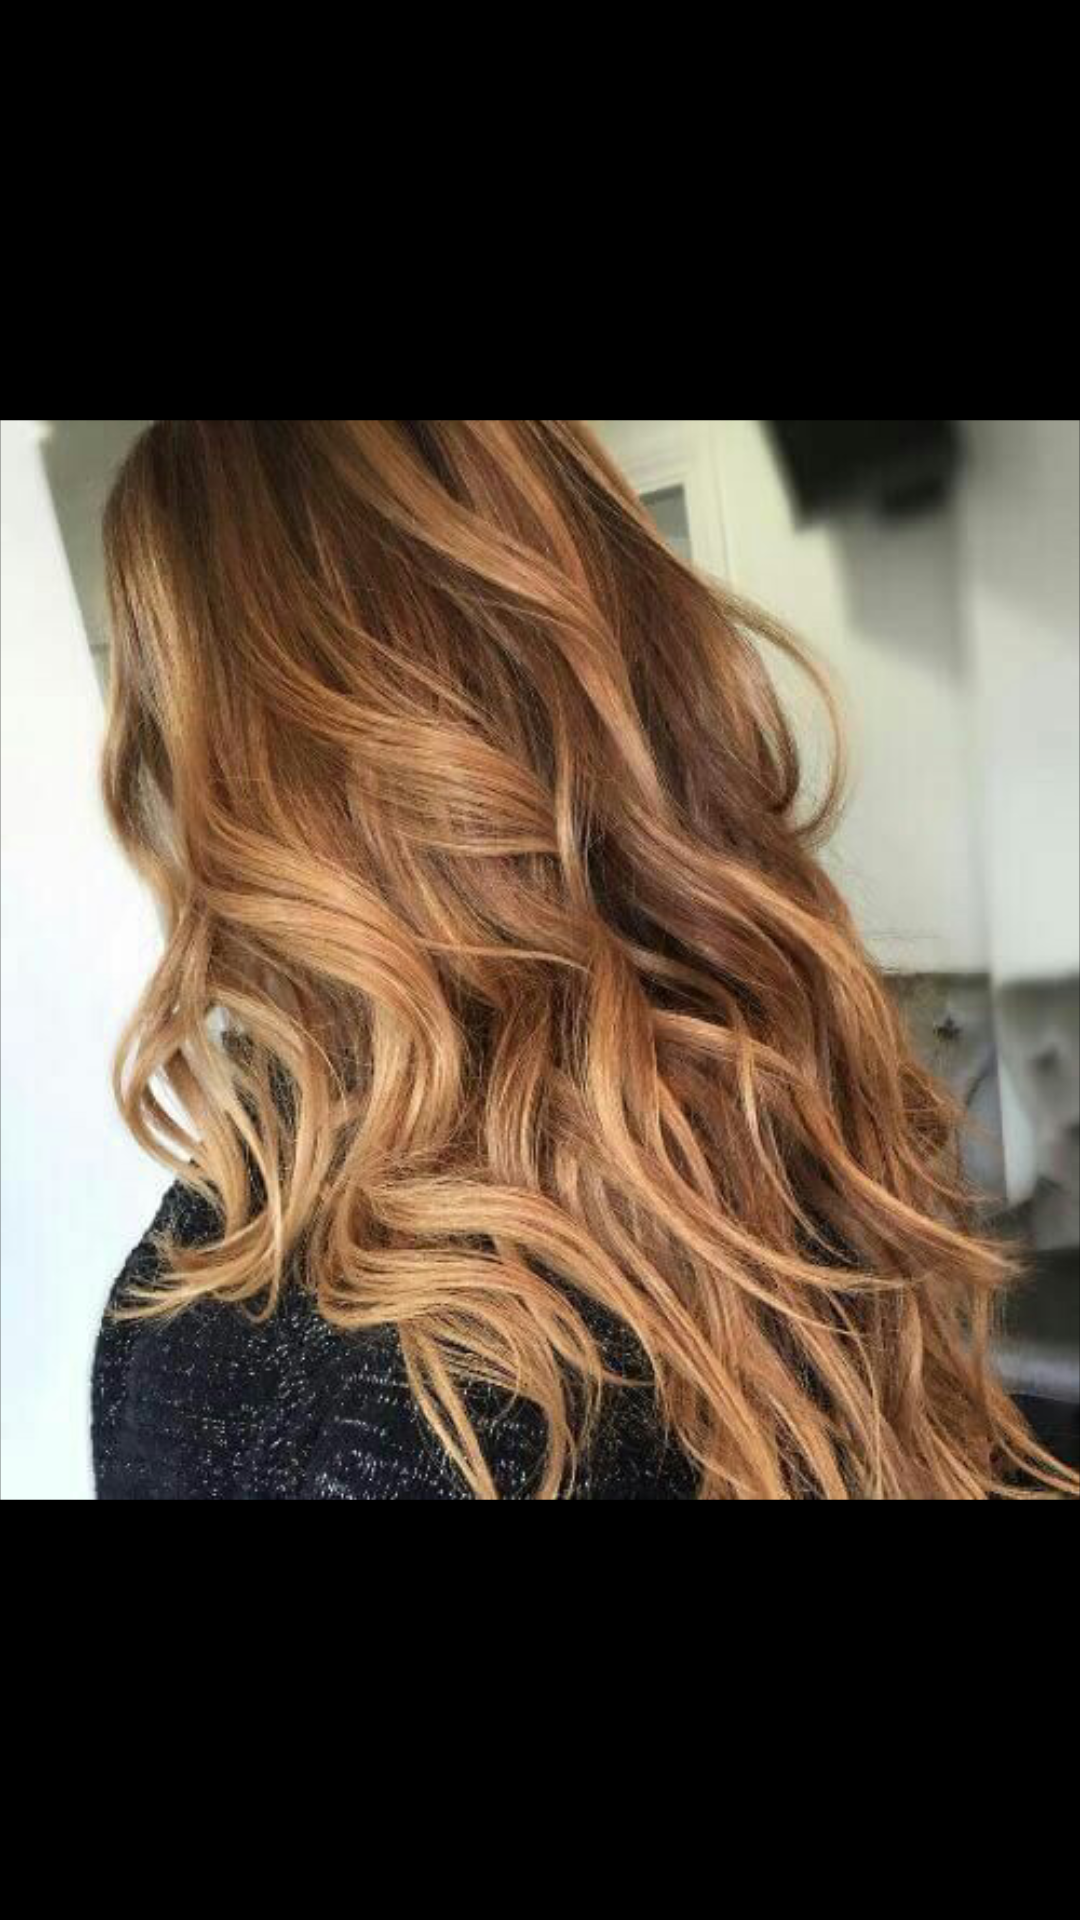 Blond, braun oder caramel - eure Lieblings Haarfarbe